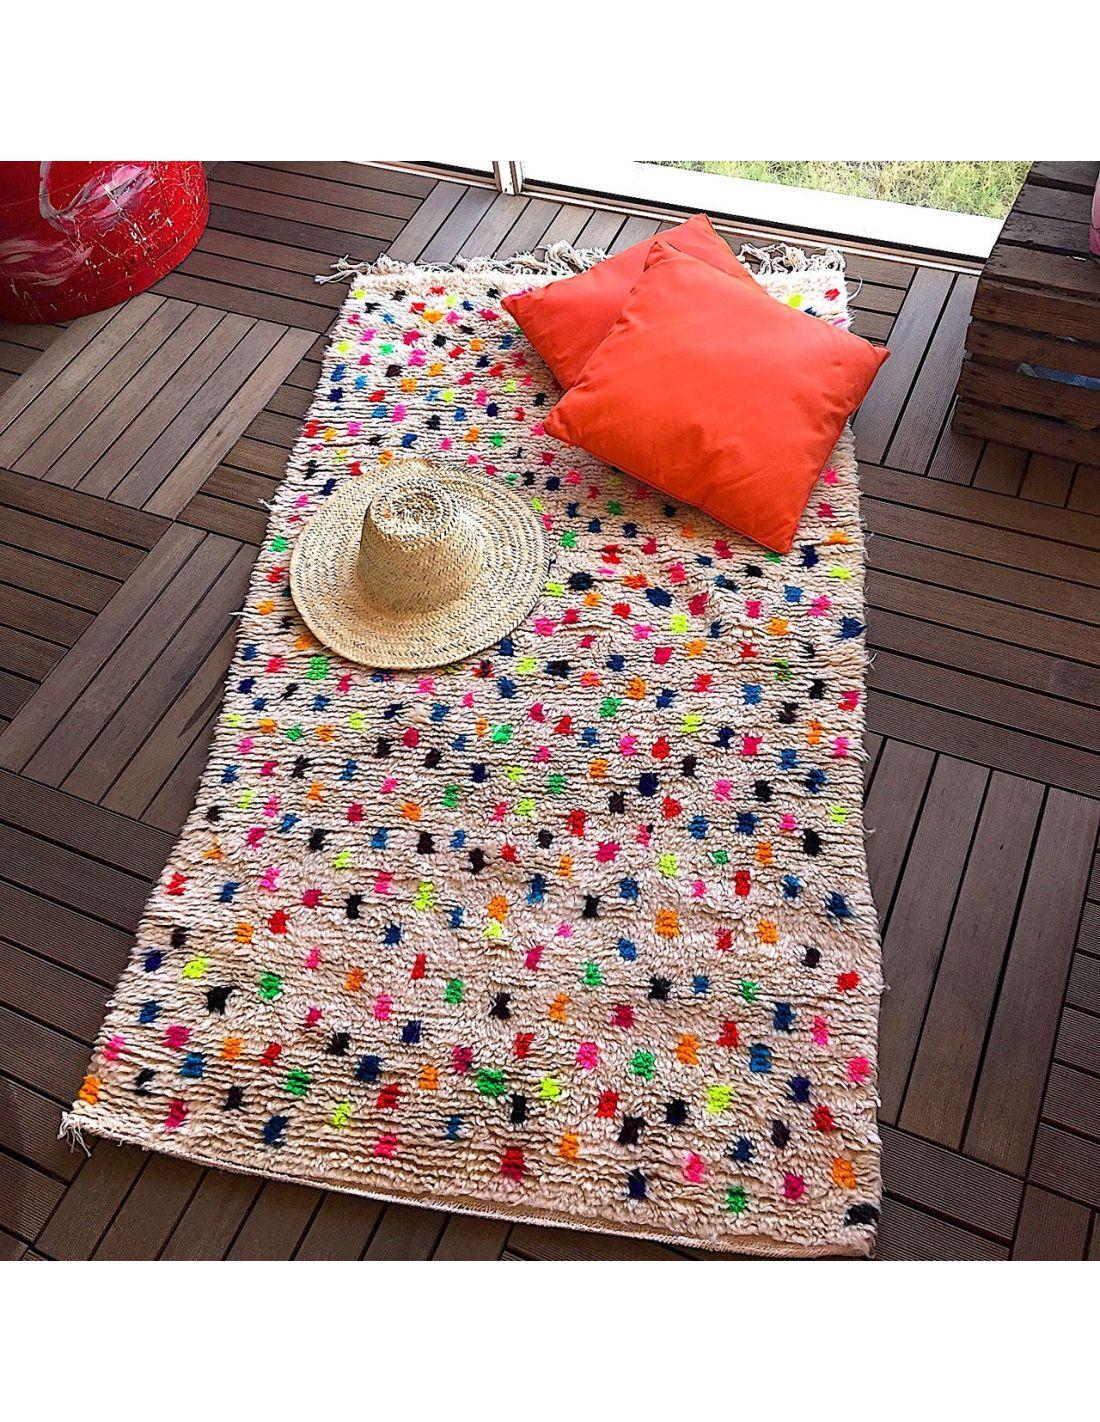 tapis berb re azilal color. Black Bedroom Furniture Sets. Home Design Ideas